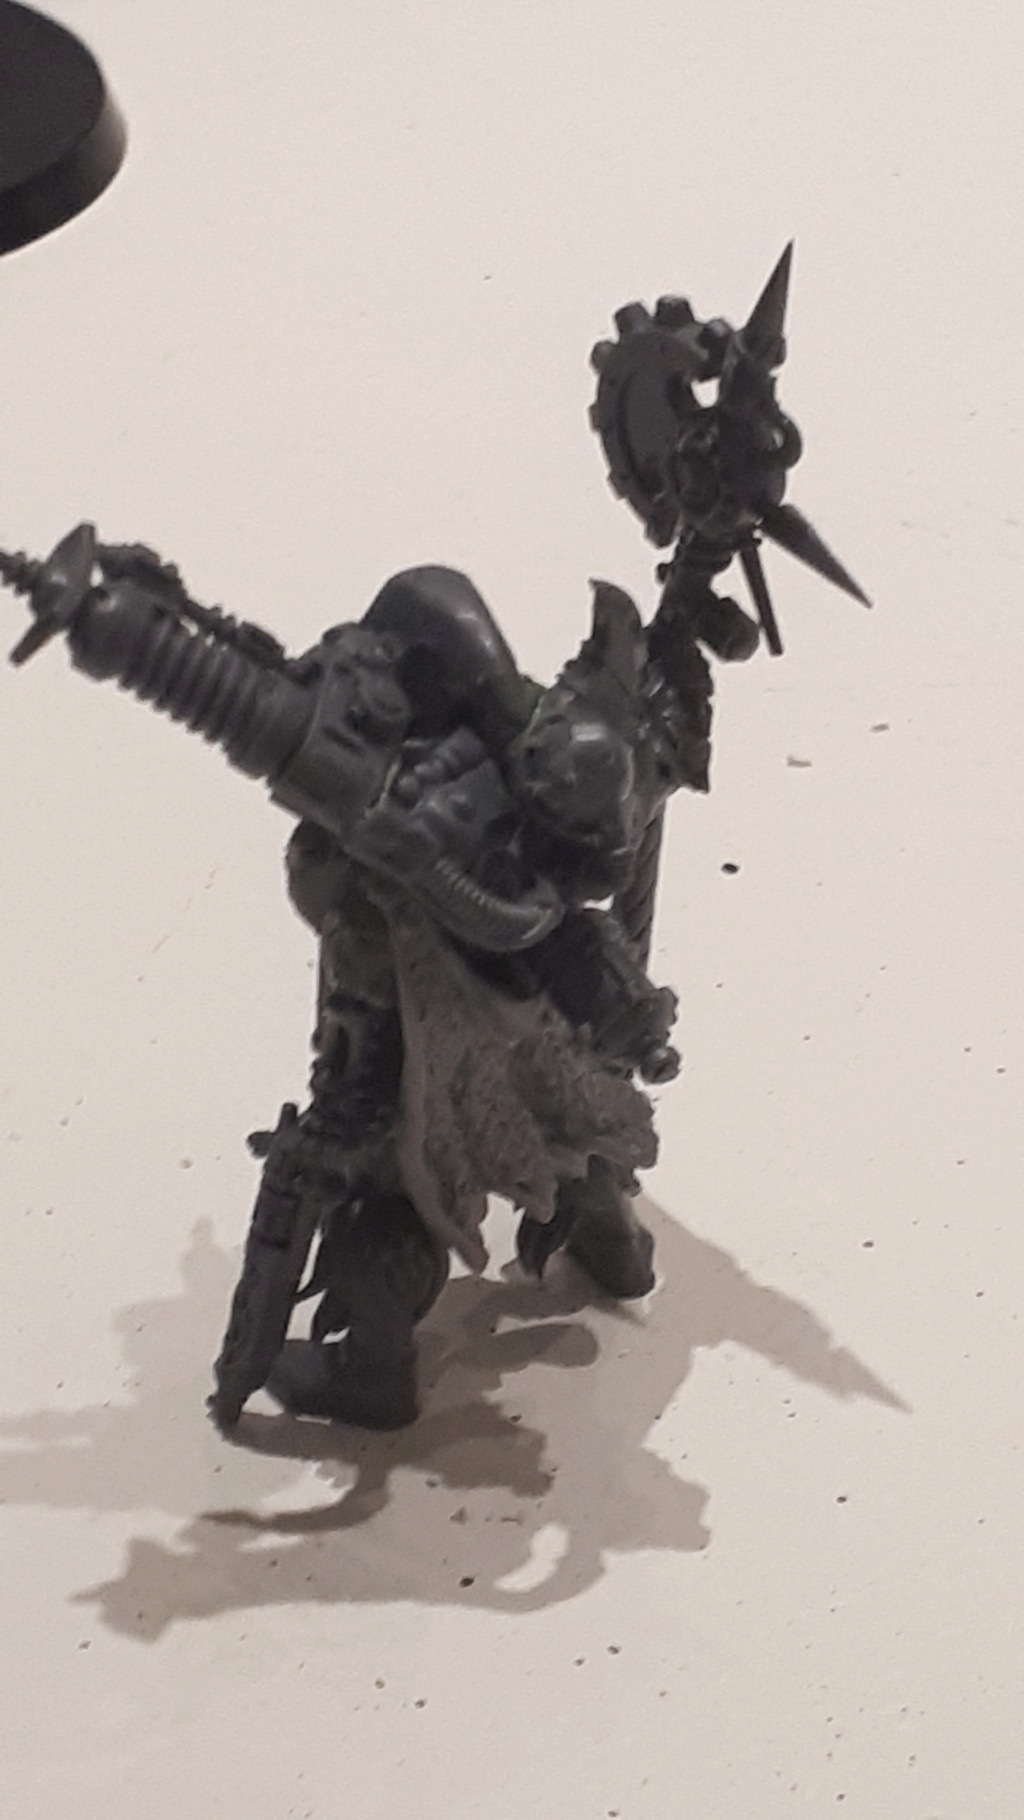 [Adeptus Mechanicus] mes technos-barbares  20200111